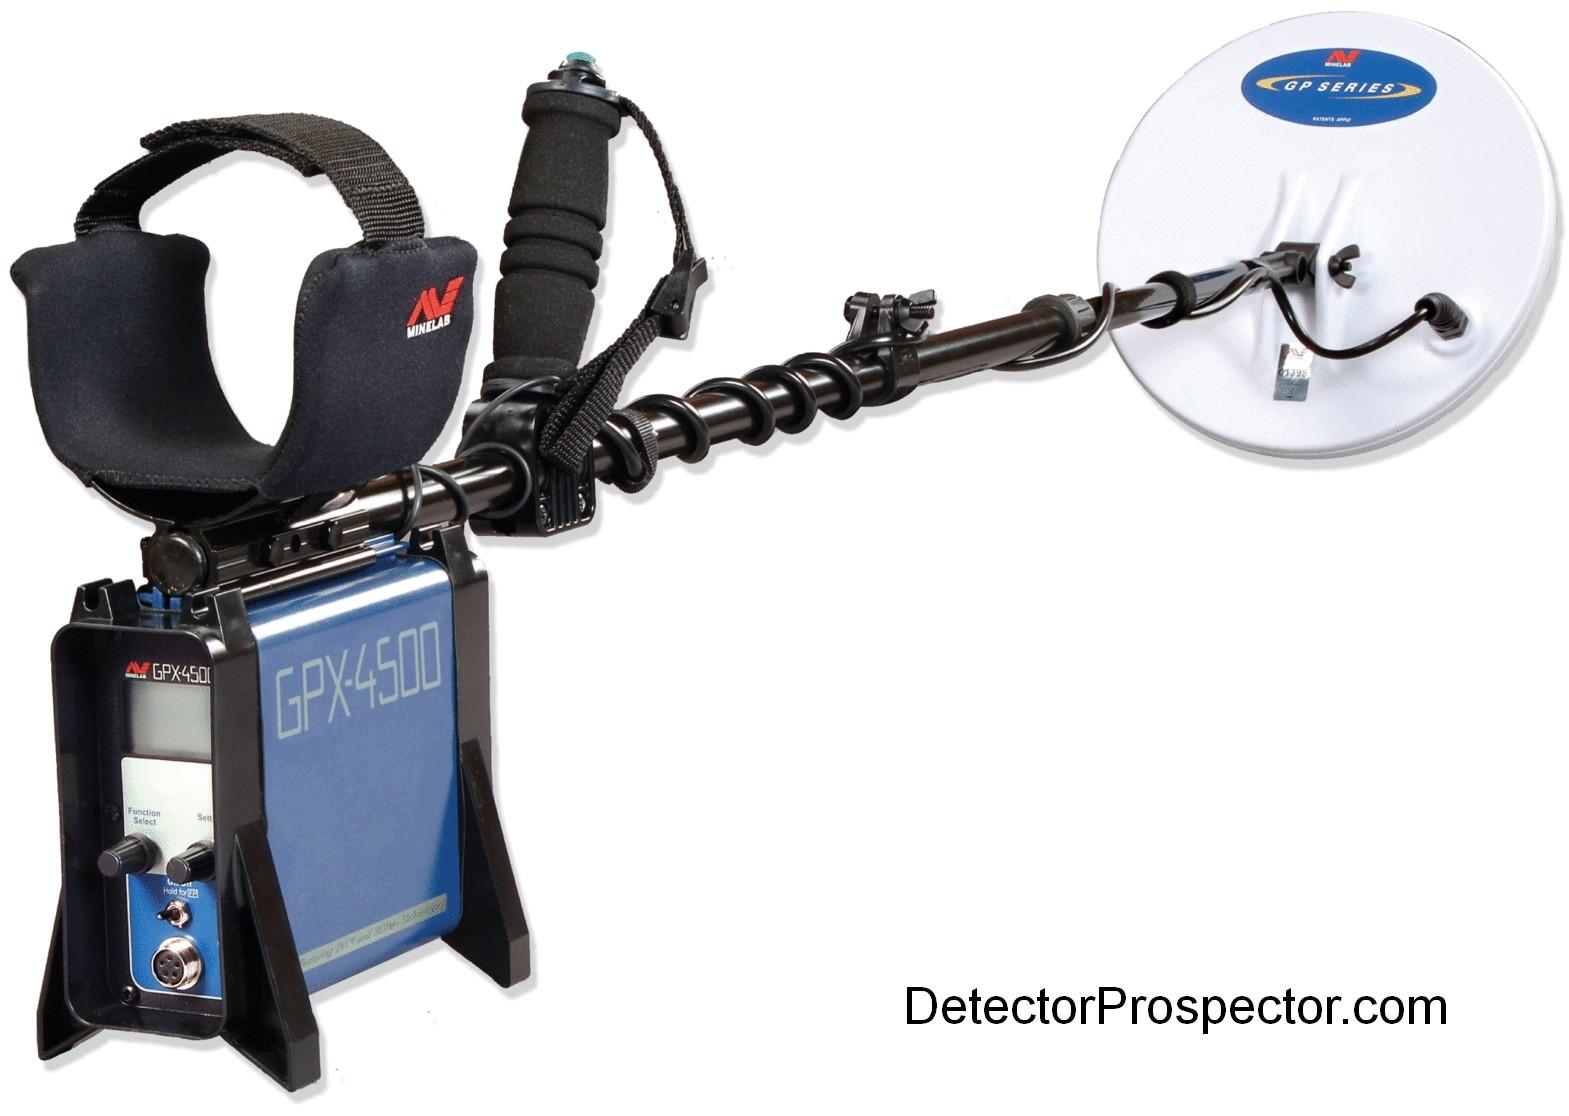 minelab-gpx-4500-pulse-induction-pi-gold-detector.jpg